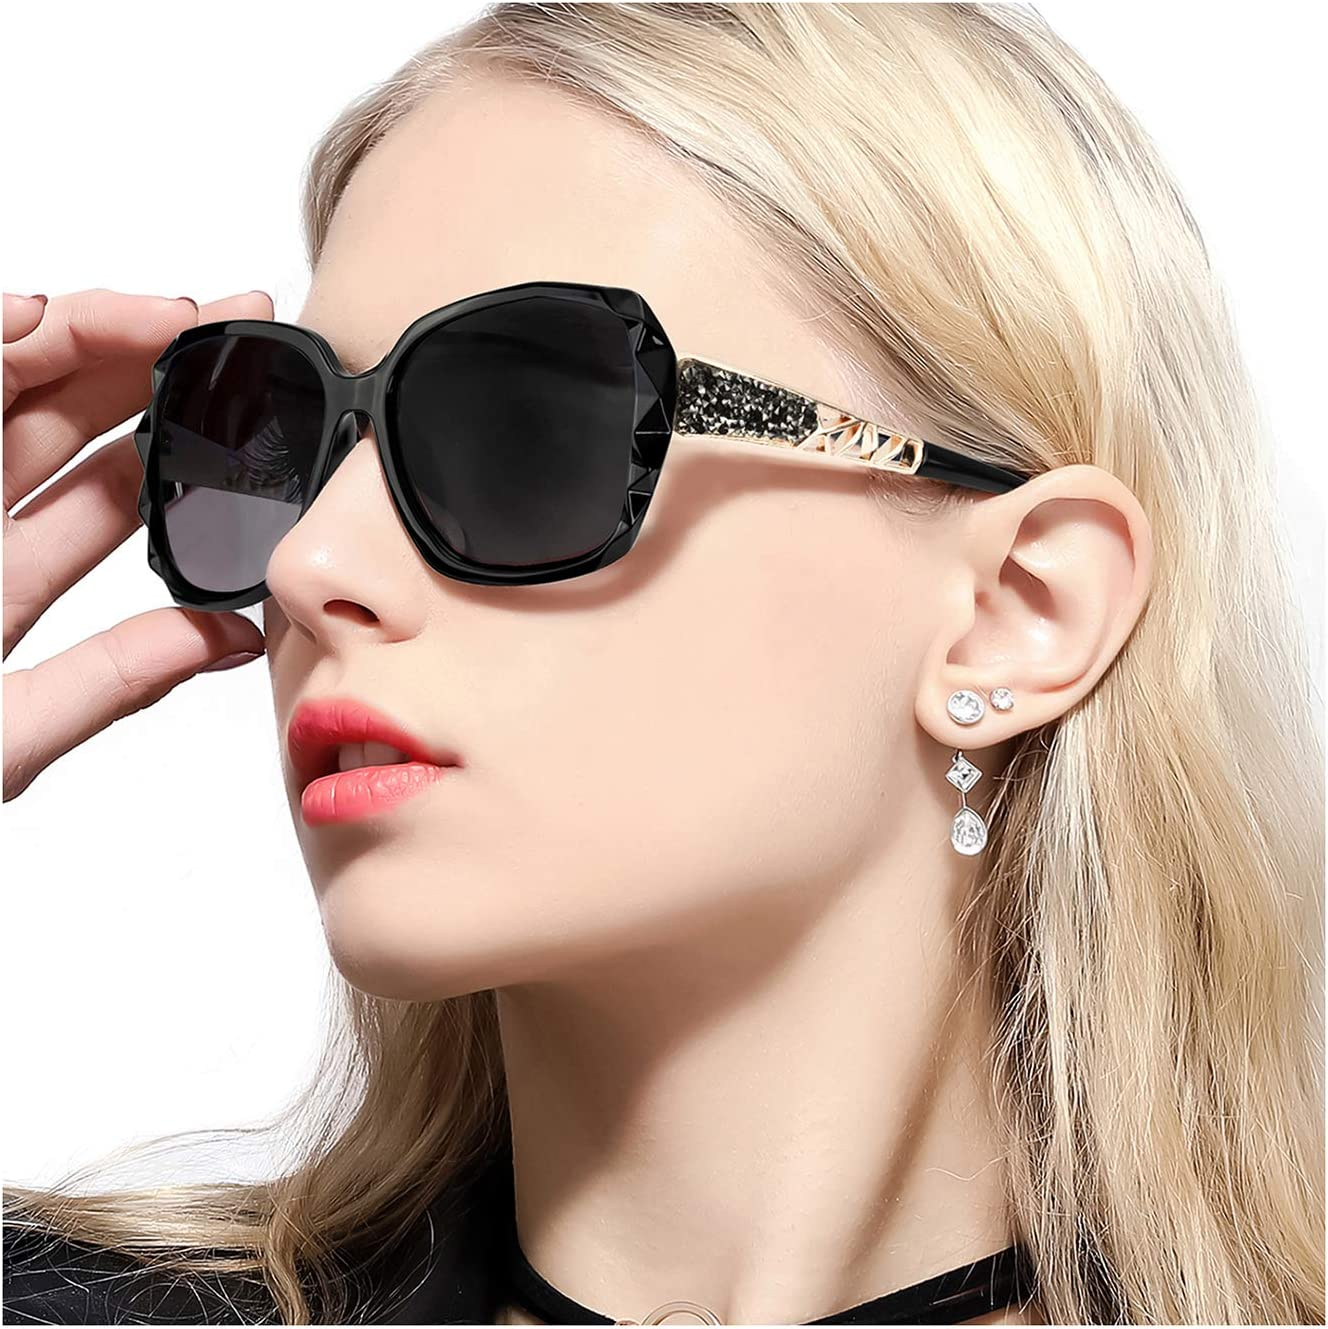 Black Sunglasses FIMILU Women Classic Oversized Polarized Sunglasses Elegant Fashion Rhinestone Design for Driving Shopping Travelling